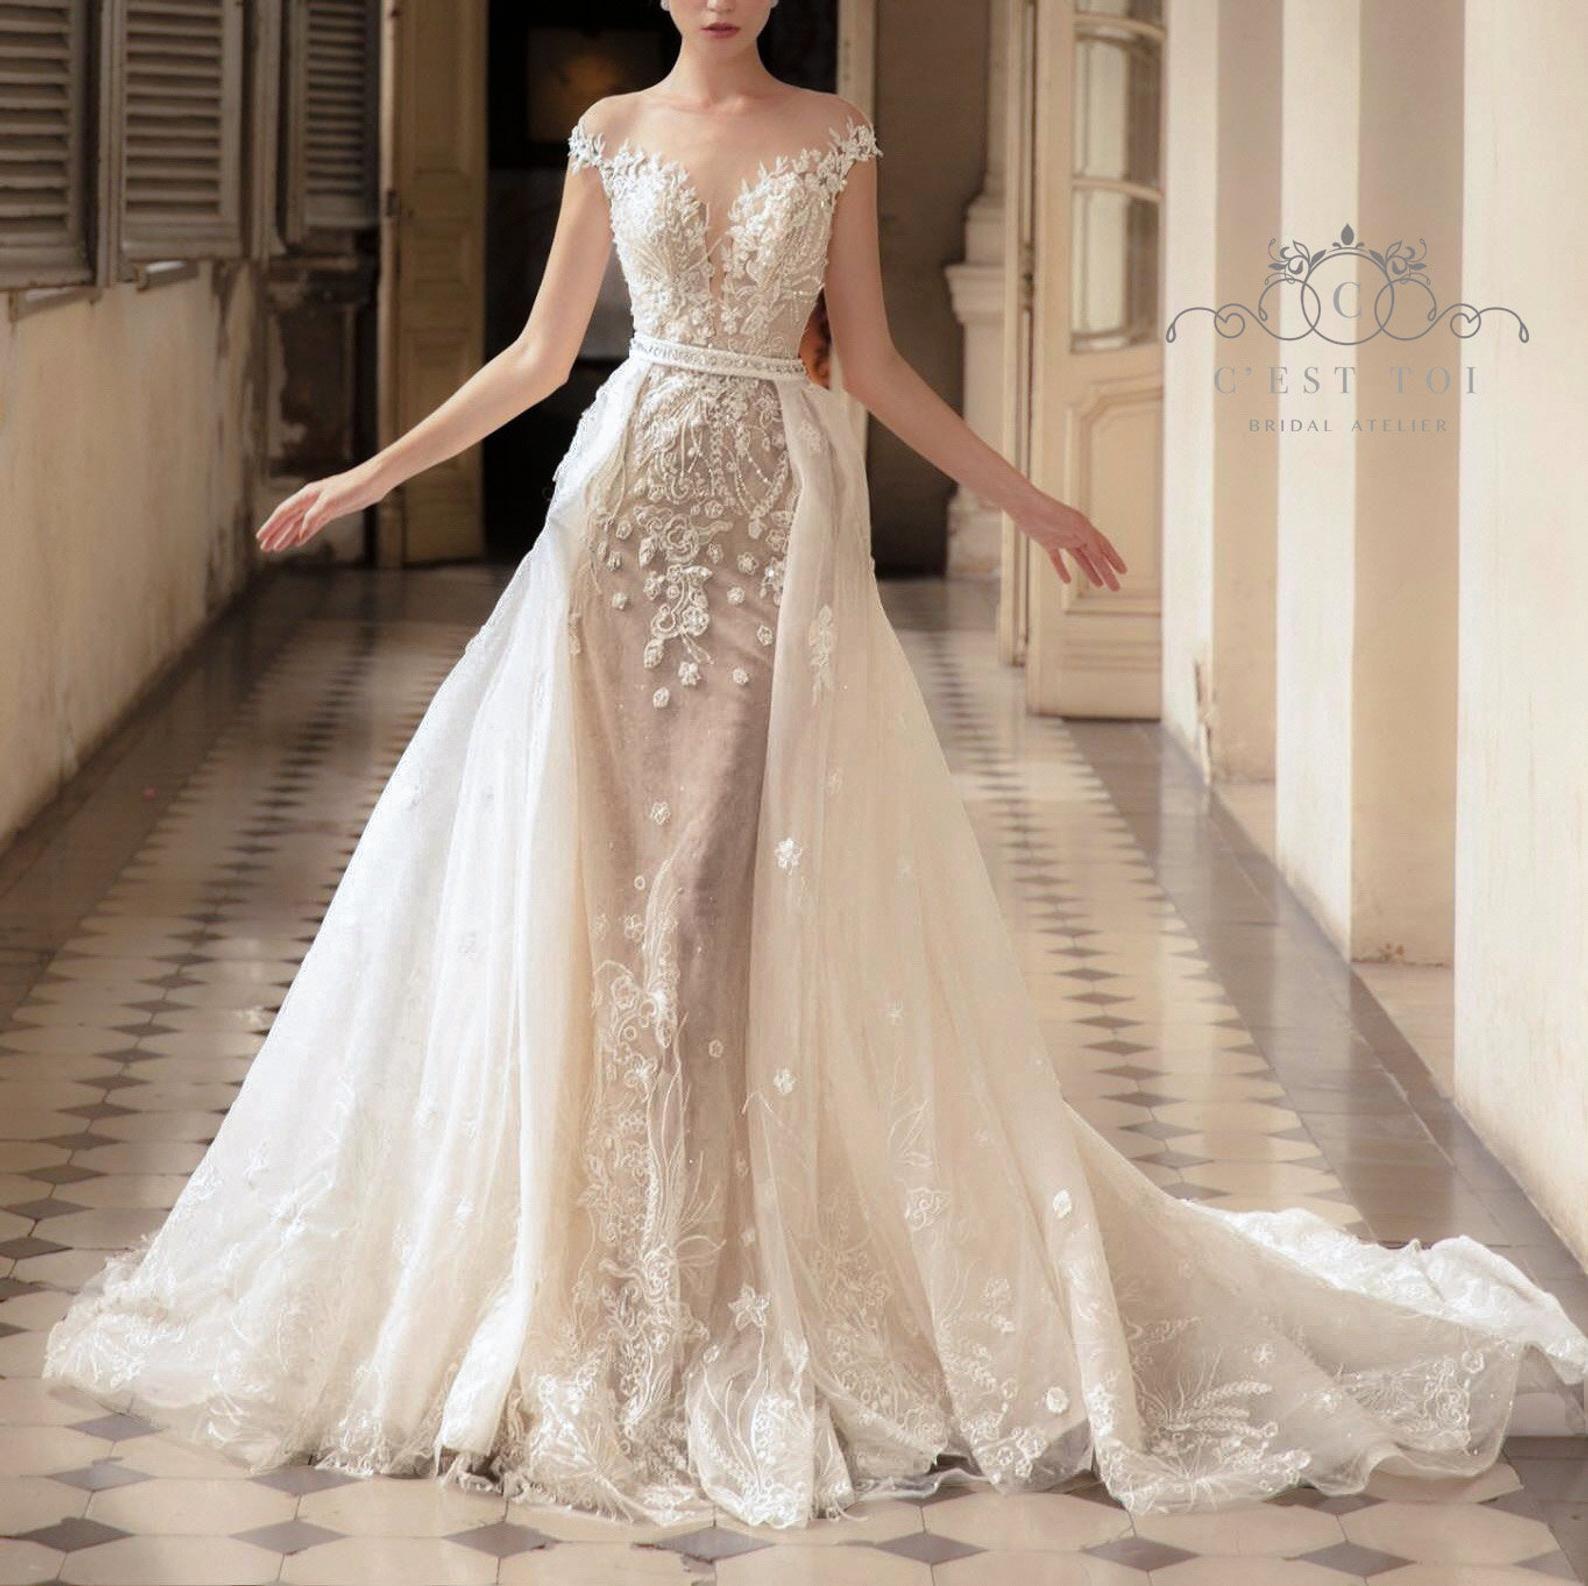 T14, Detachable Bridal Overskirt, Lace Bridal Overskirt